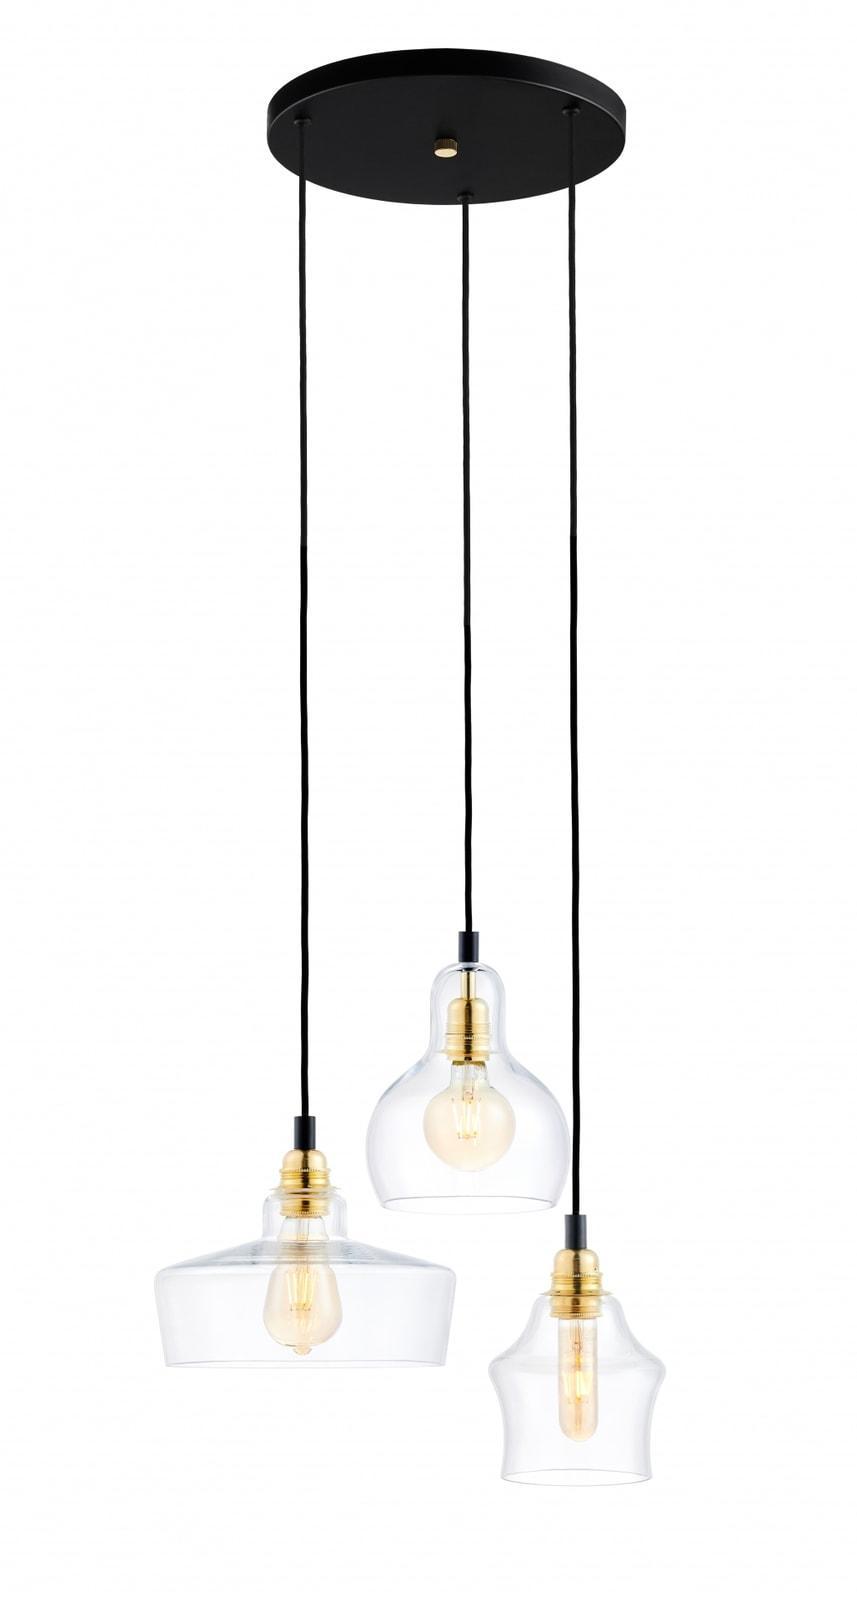 Longis Lampa Wiszaca 3 Gold Kolor Czarny Transparent Zloty 1864